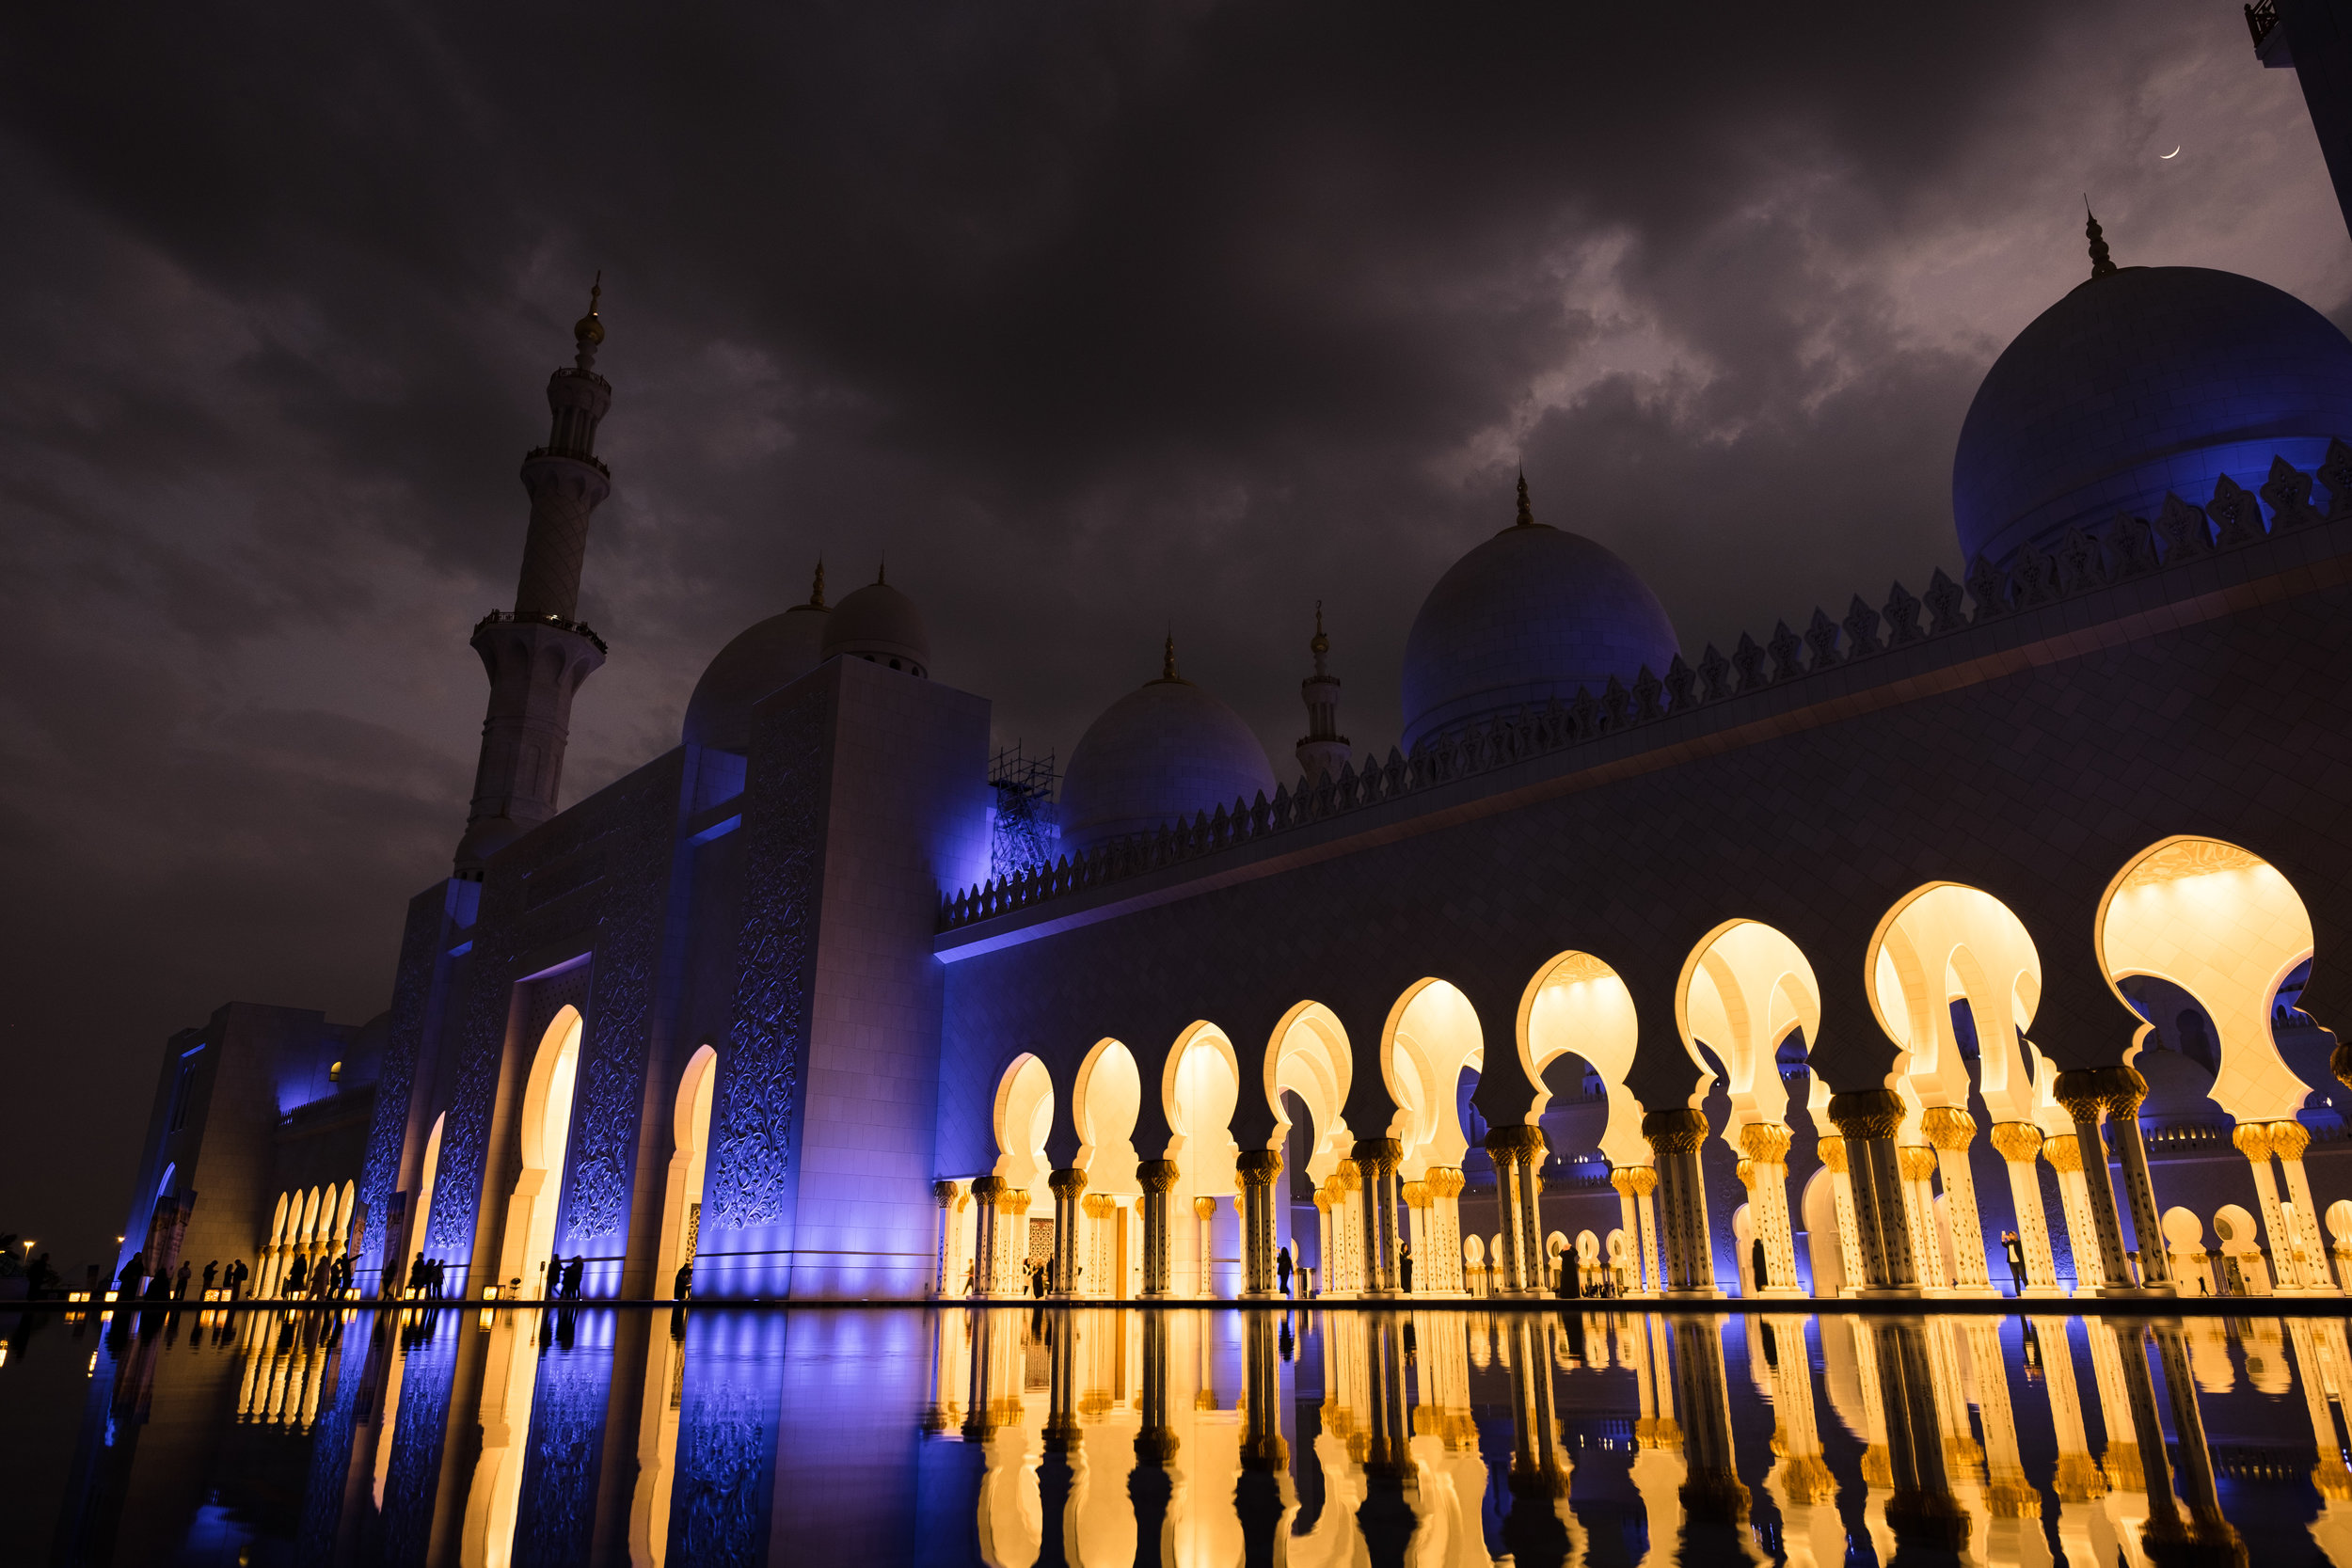 Abu Dhabi,  UAE , Fujifilm X-T1, Fujifilm XF 14mm f/2.8 @ f/5